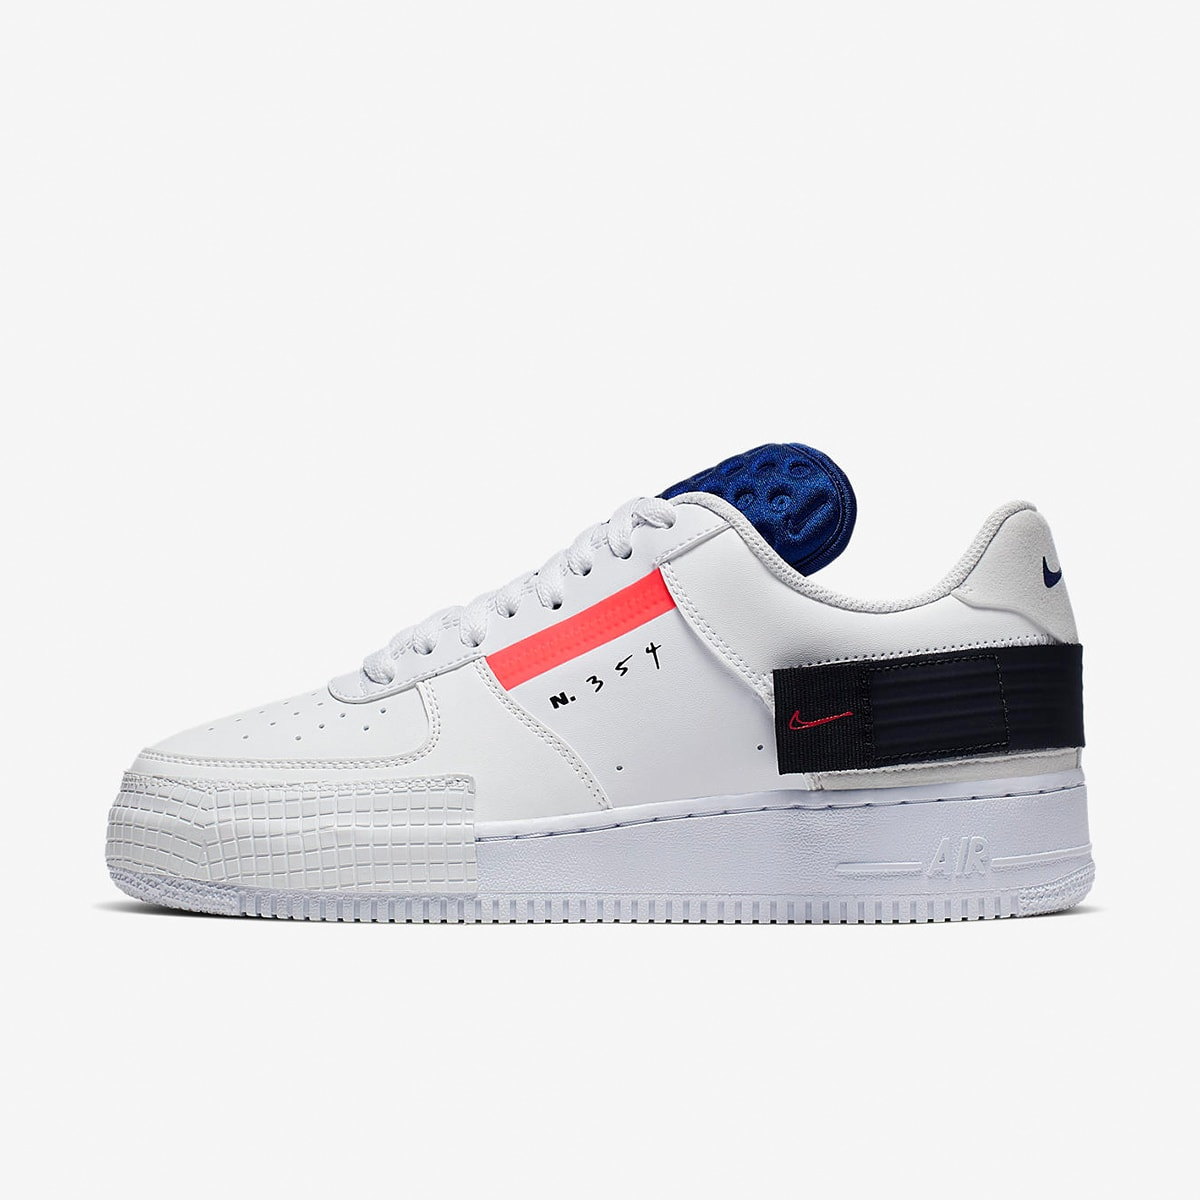 Fresh Sneaker Boutique | NIKE AIR FORCE 1 MID 07 Fresh